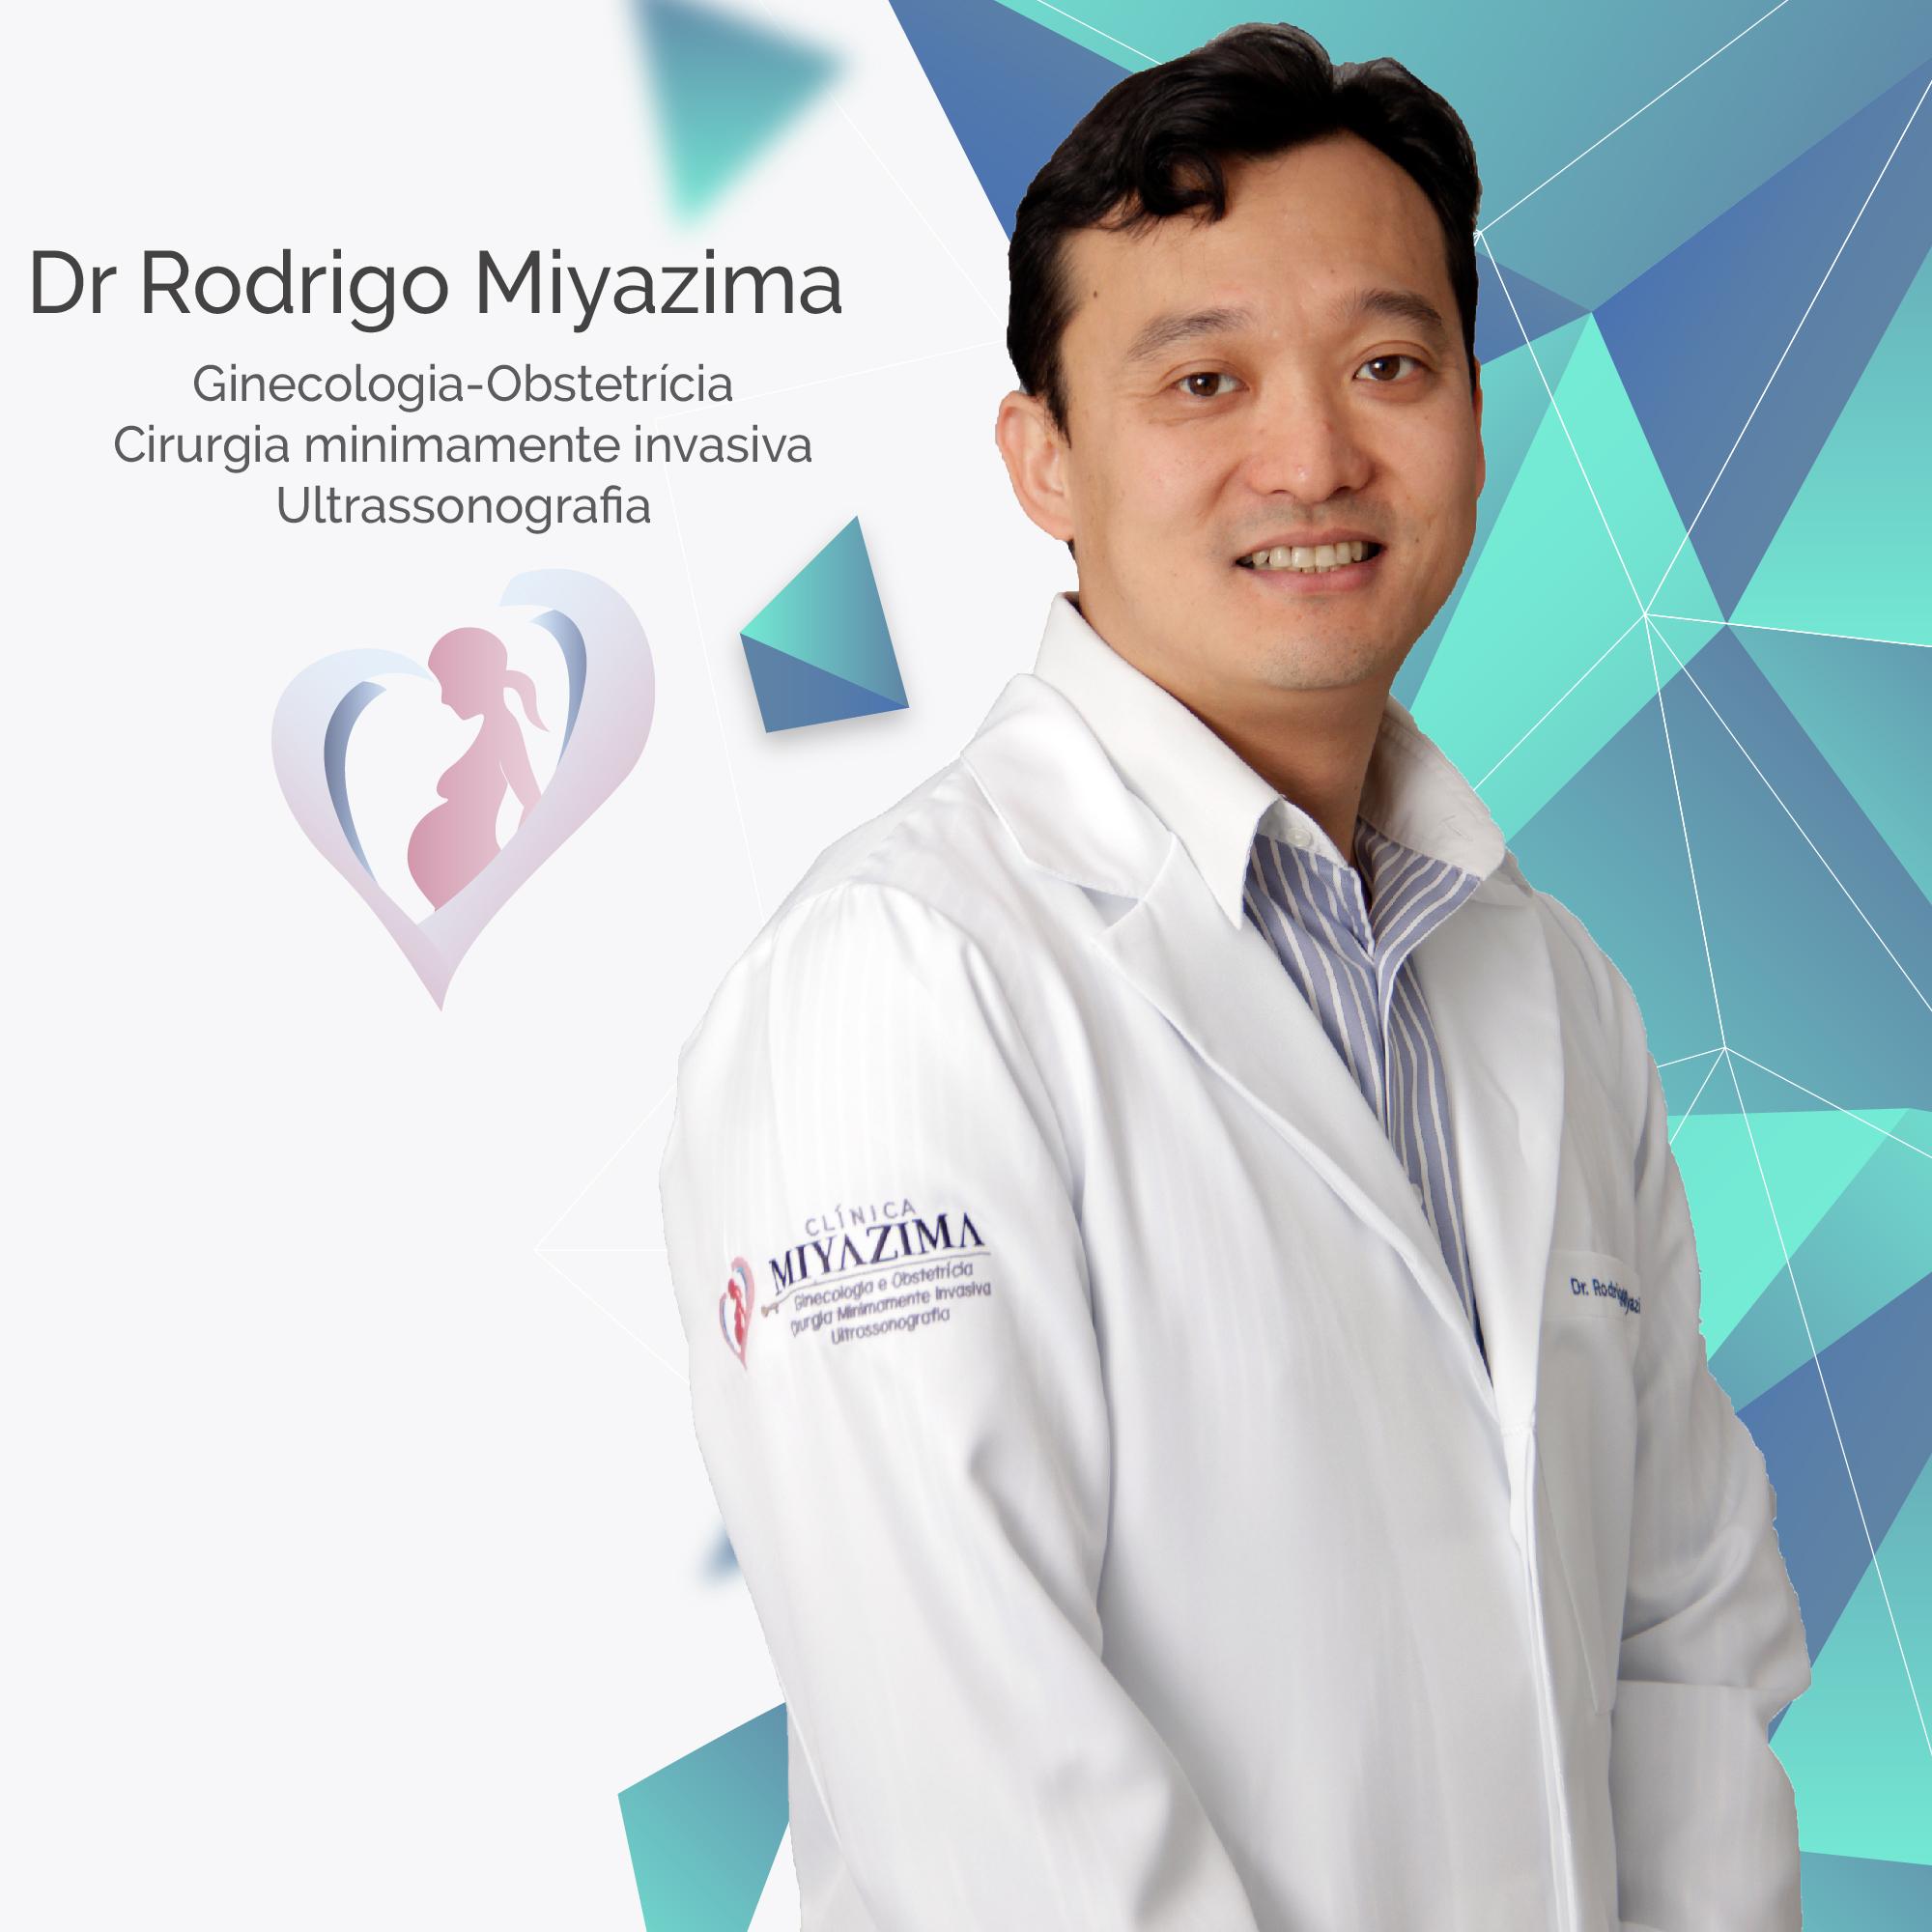 Dr Rodrigo Miyazima - Ginecologista Obstetra